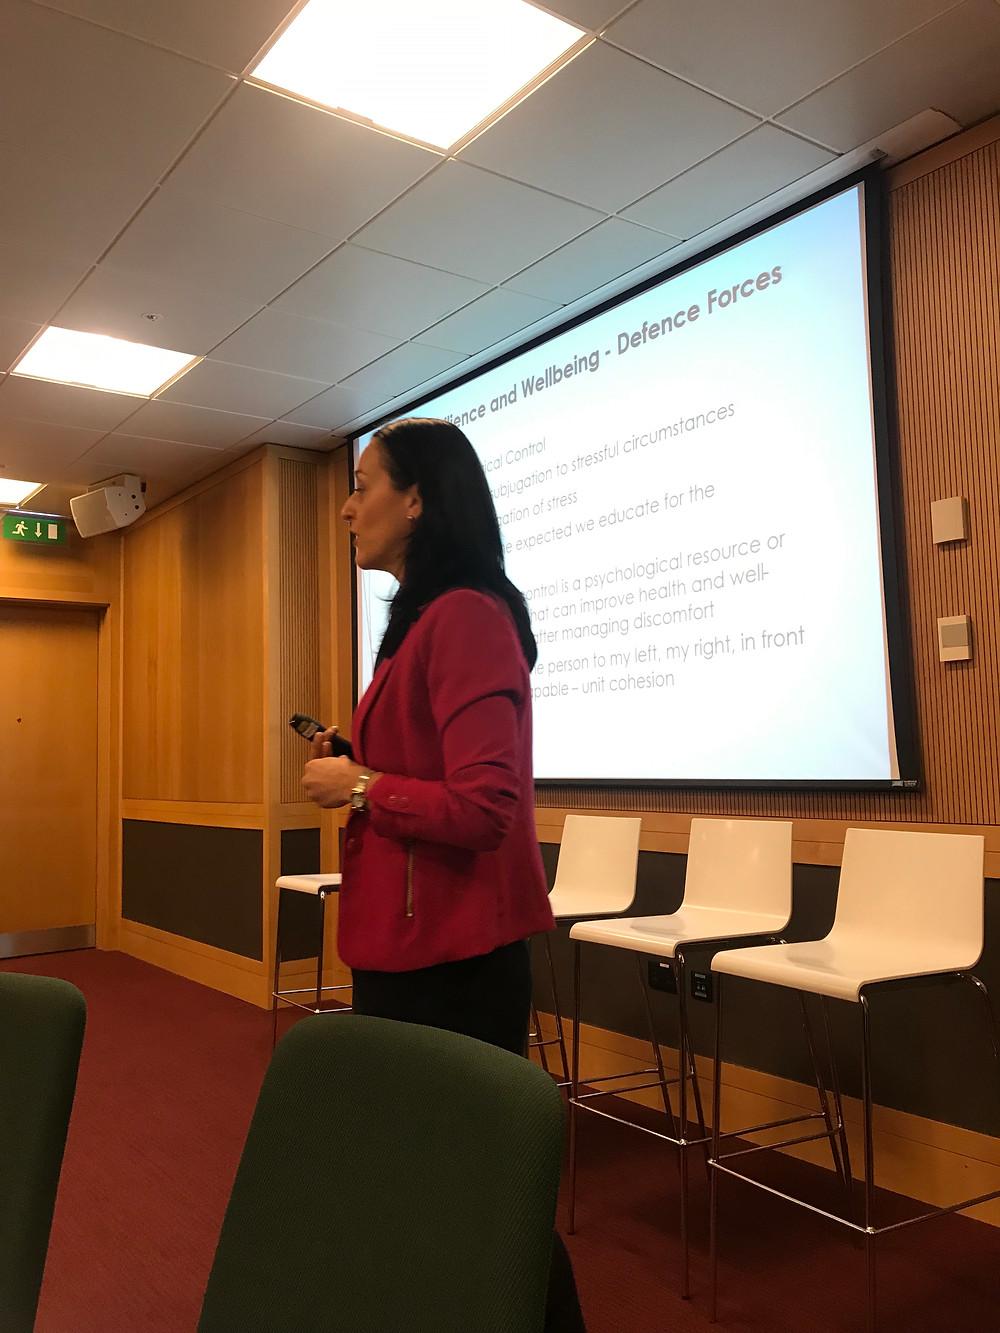 Yvonne Kearney Irish Defence Forces PepTalk - Corporate Wellbeing